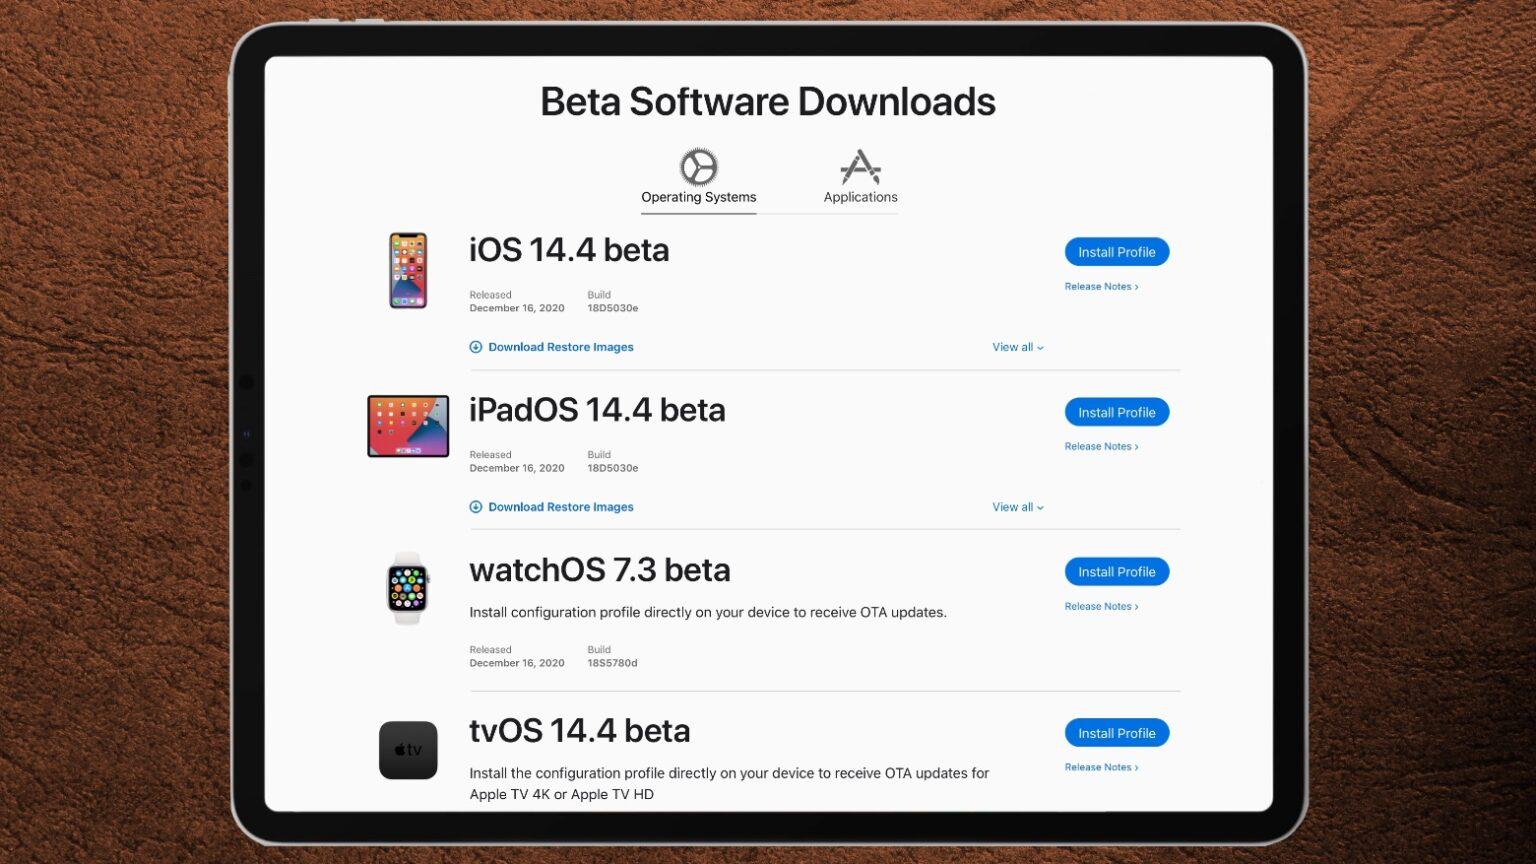 iOS 14.4 beta 1, iPadOS 14.4 beta 1, watchOS 7.3 beta 1 and tvOS 14.4 beta 1